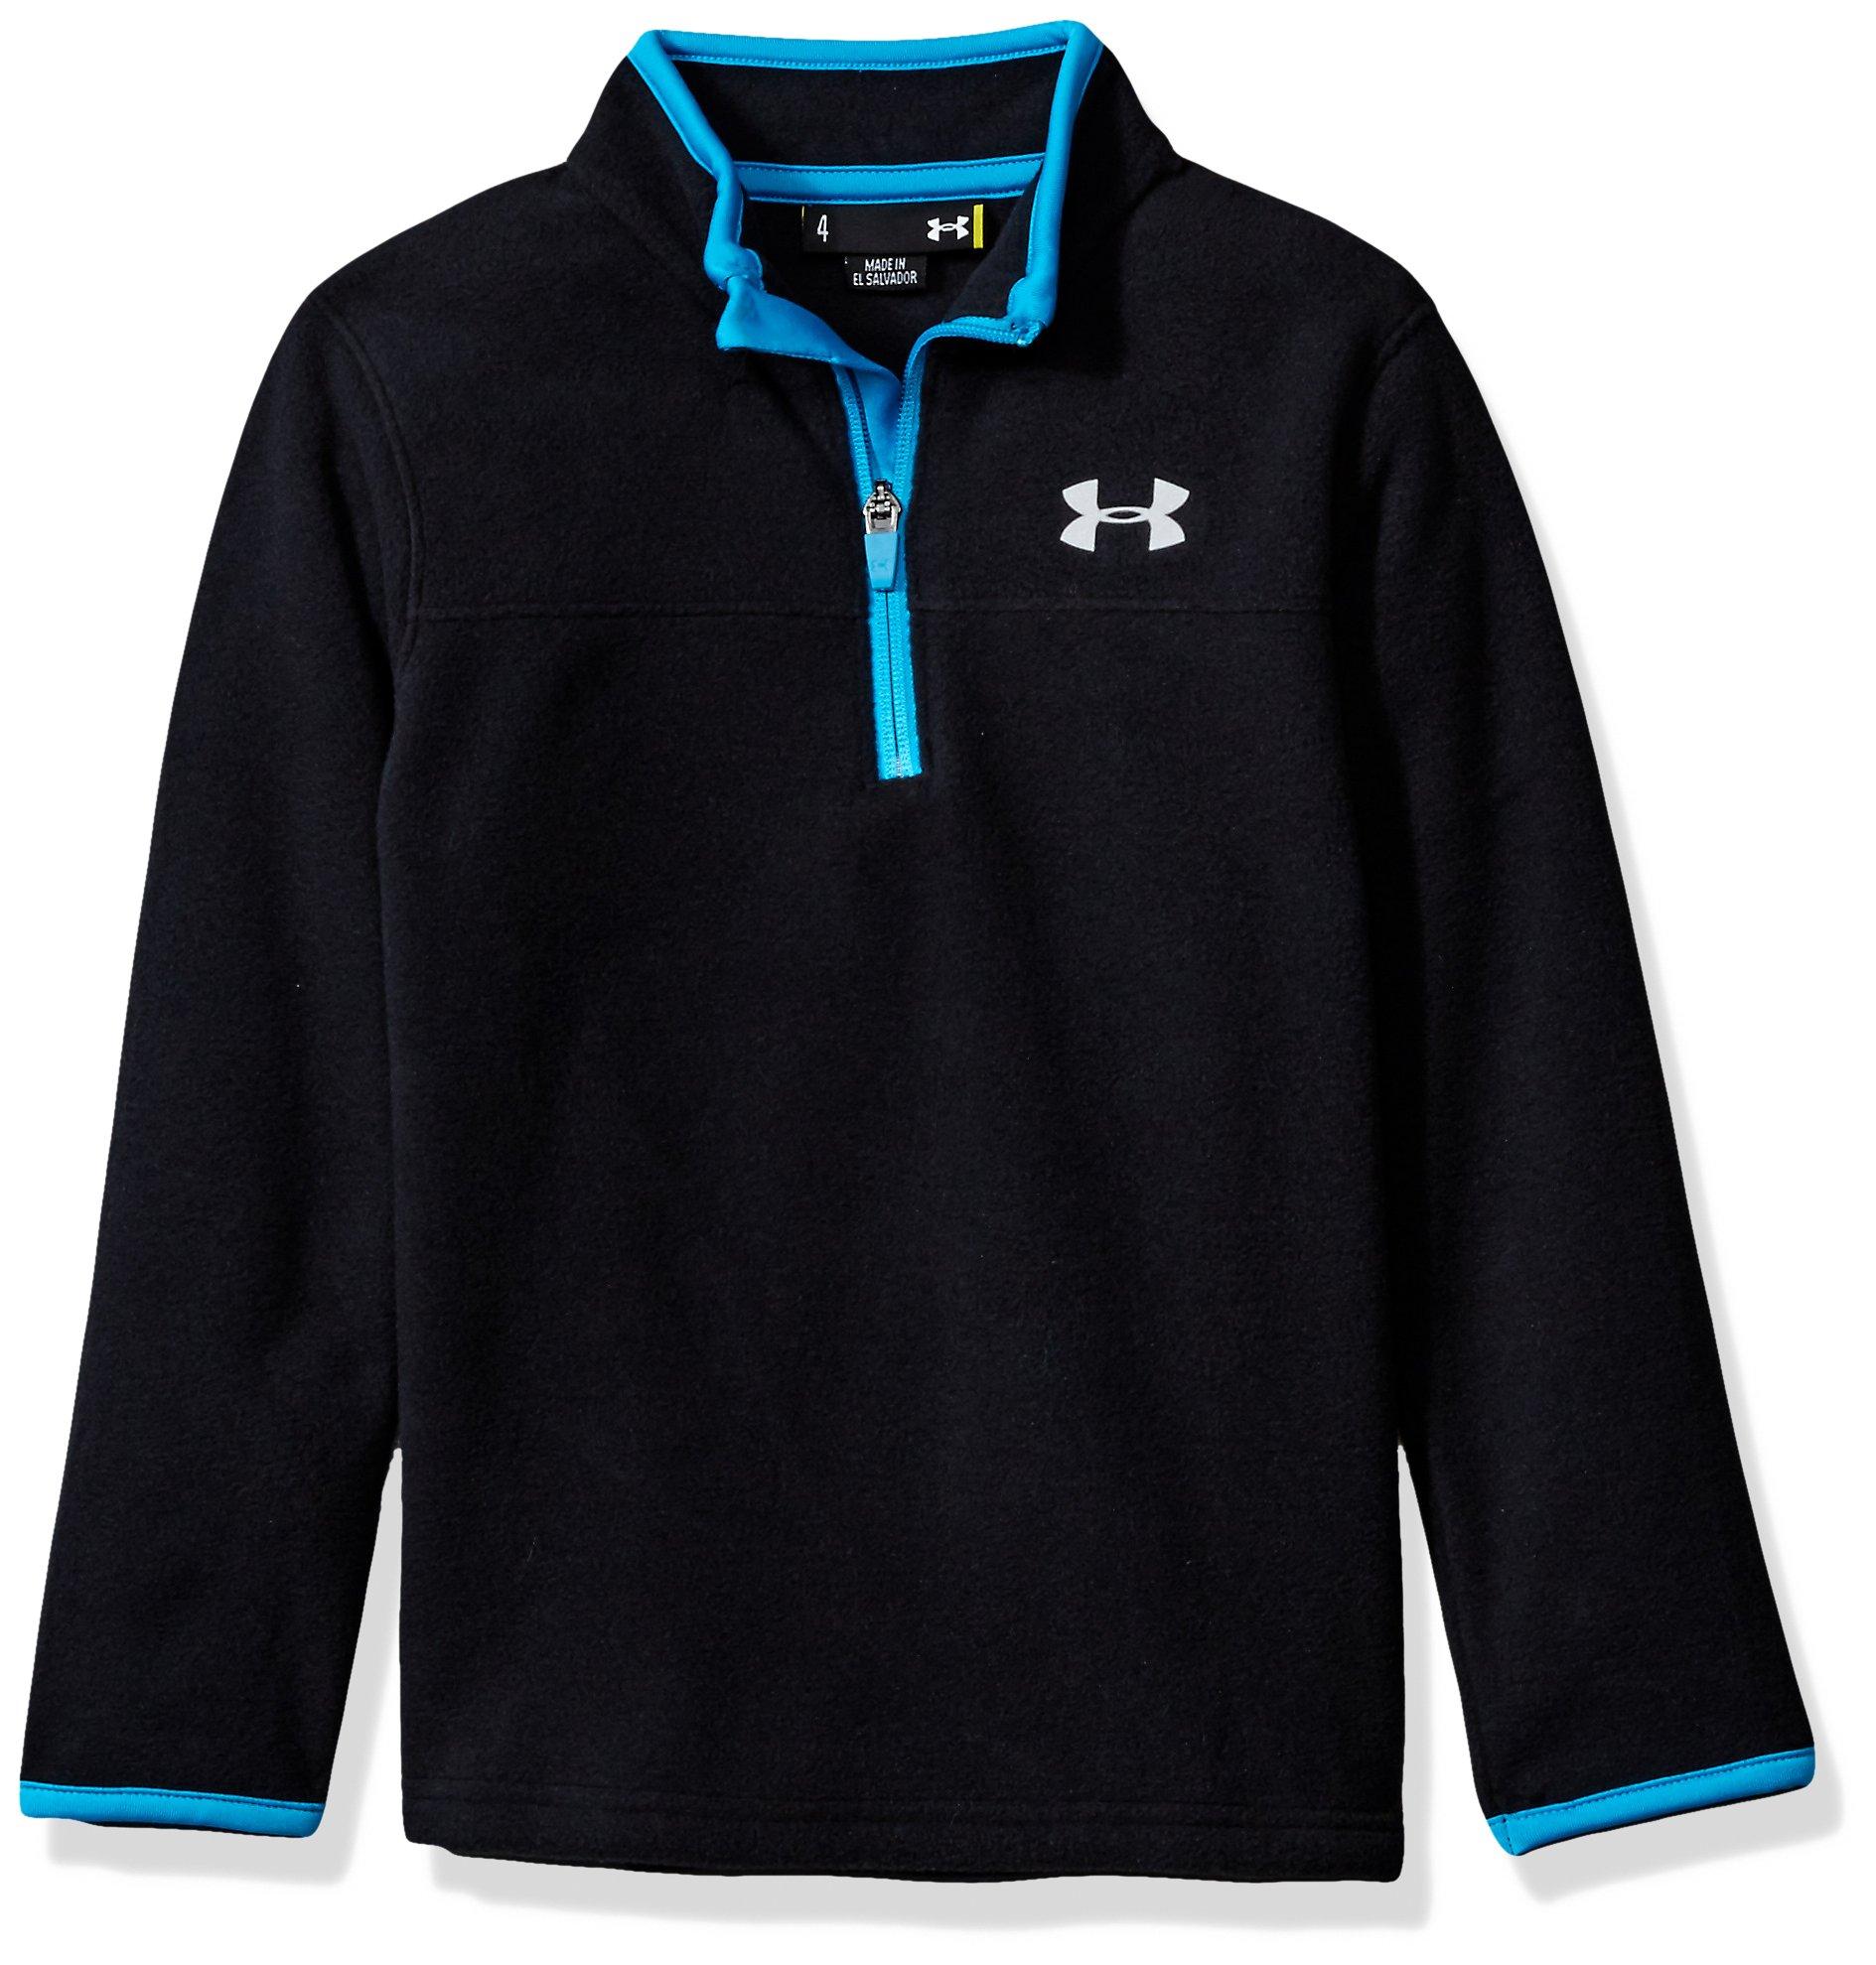 Under Armour Boys' Little Solid Logo 1/4 Zip Fleece Sweater, Black, 5